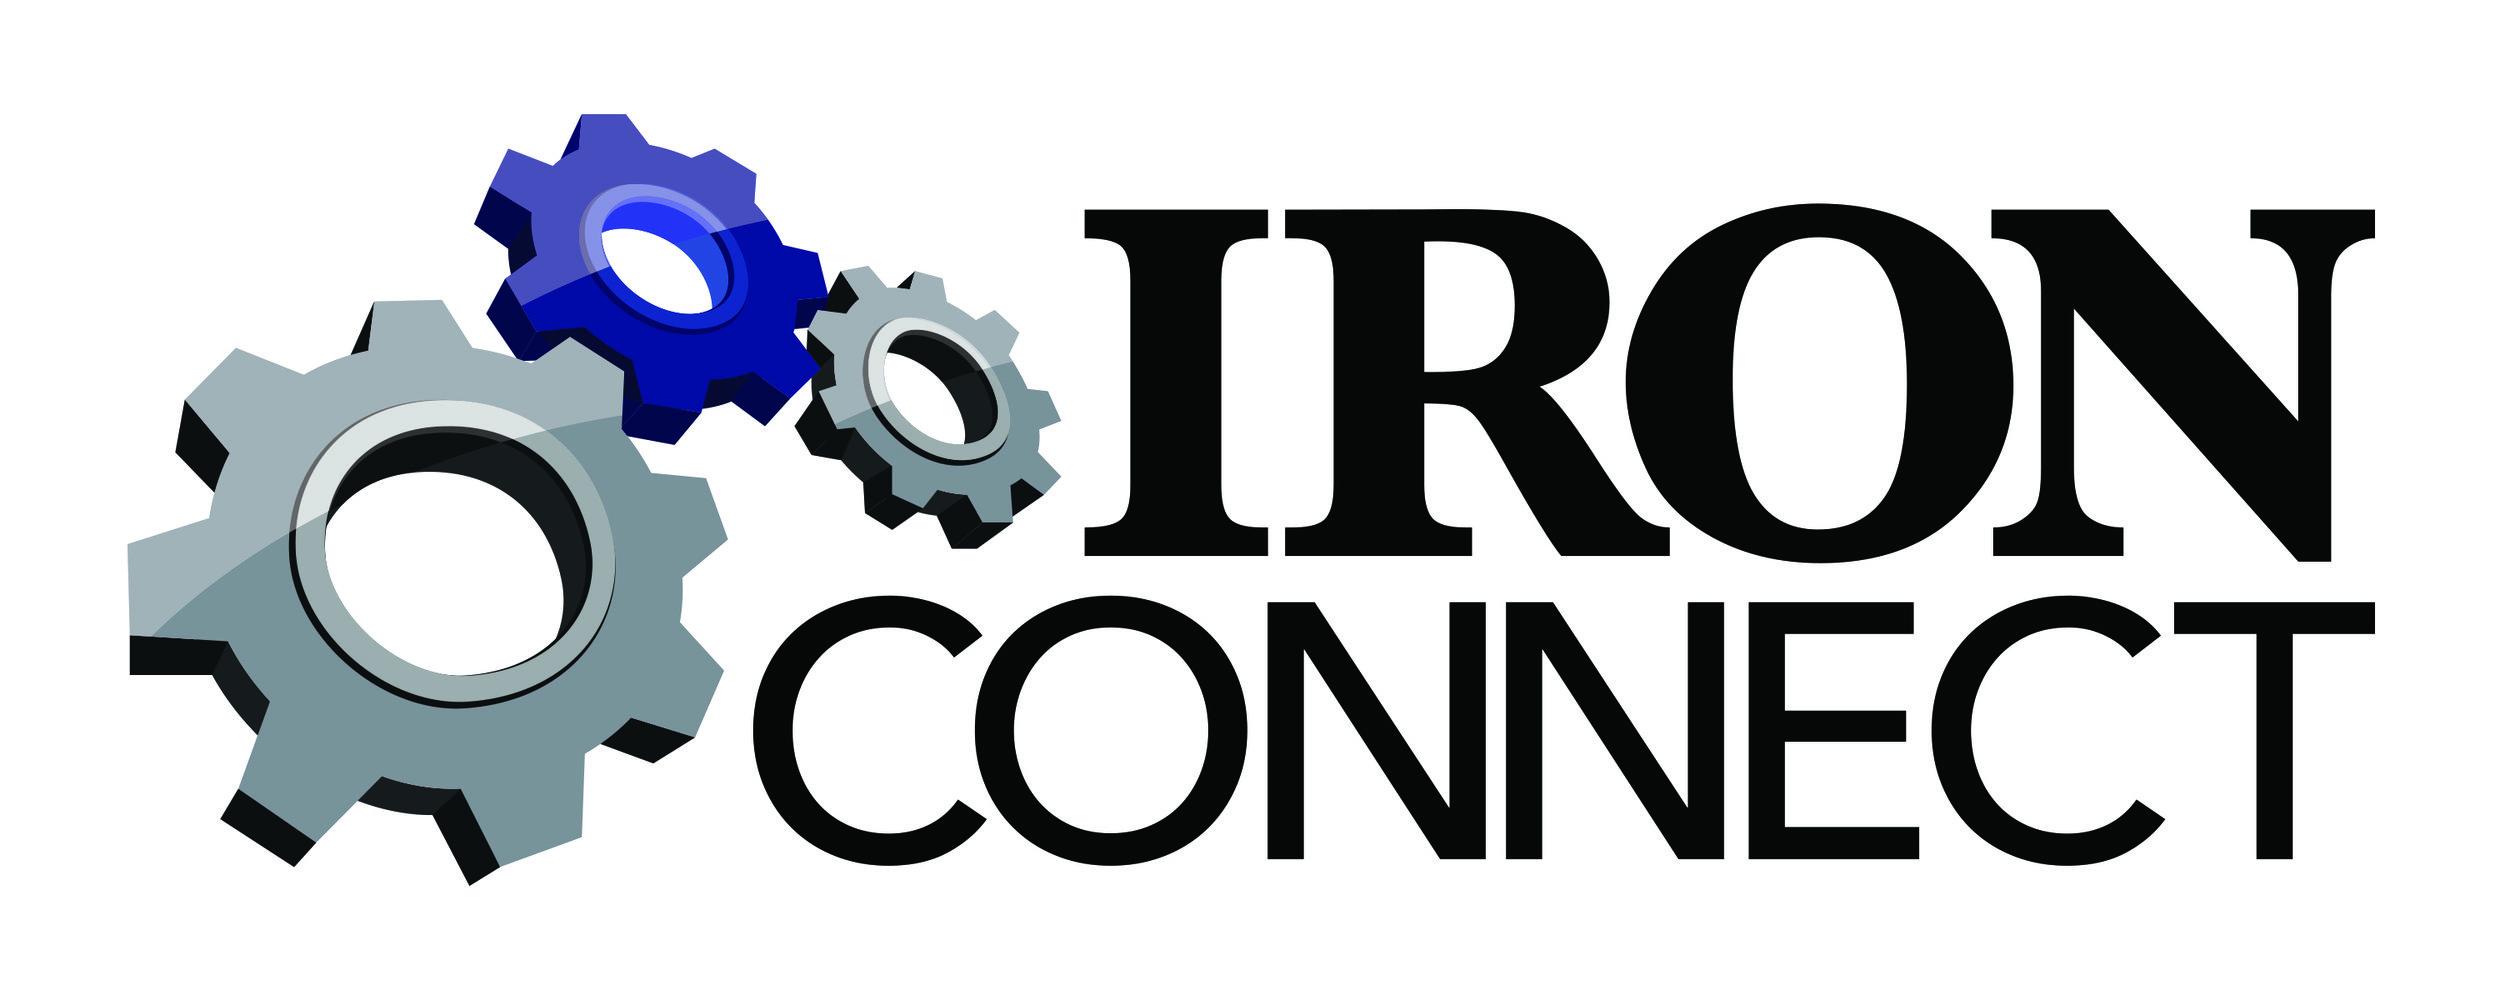 IronConnect_CMYK_WhiteBKD.JPG